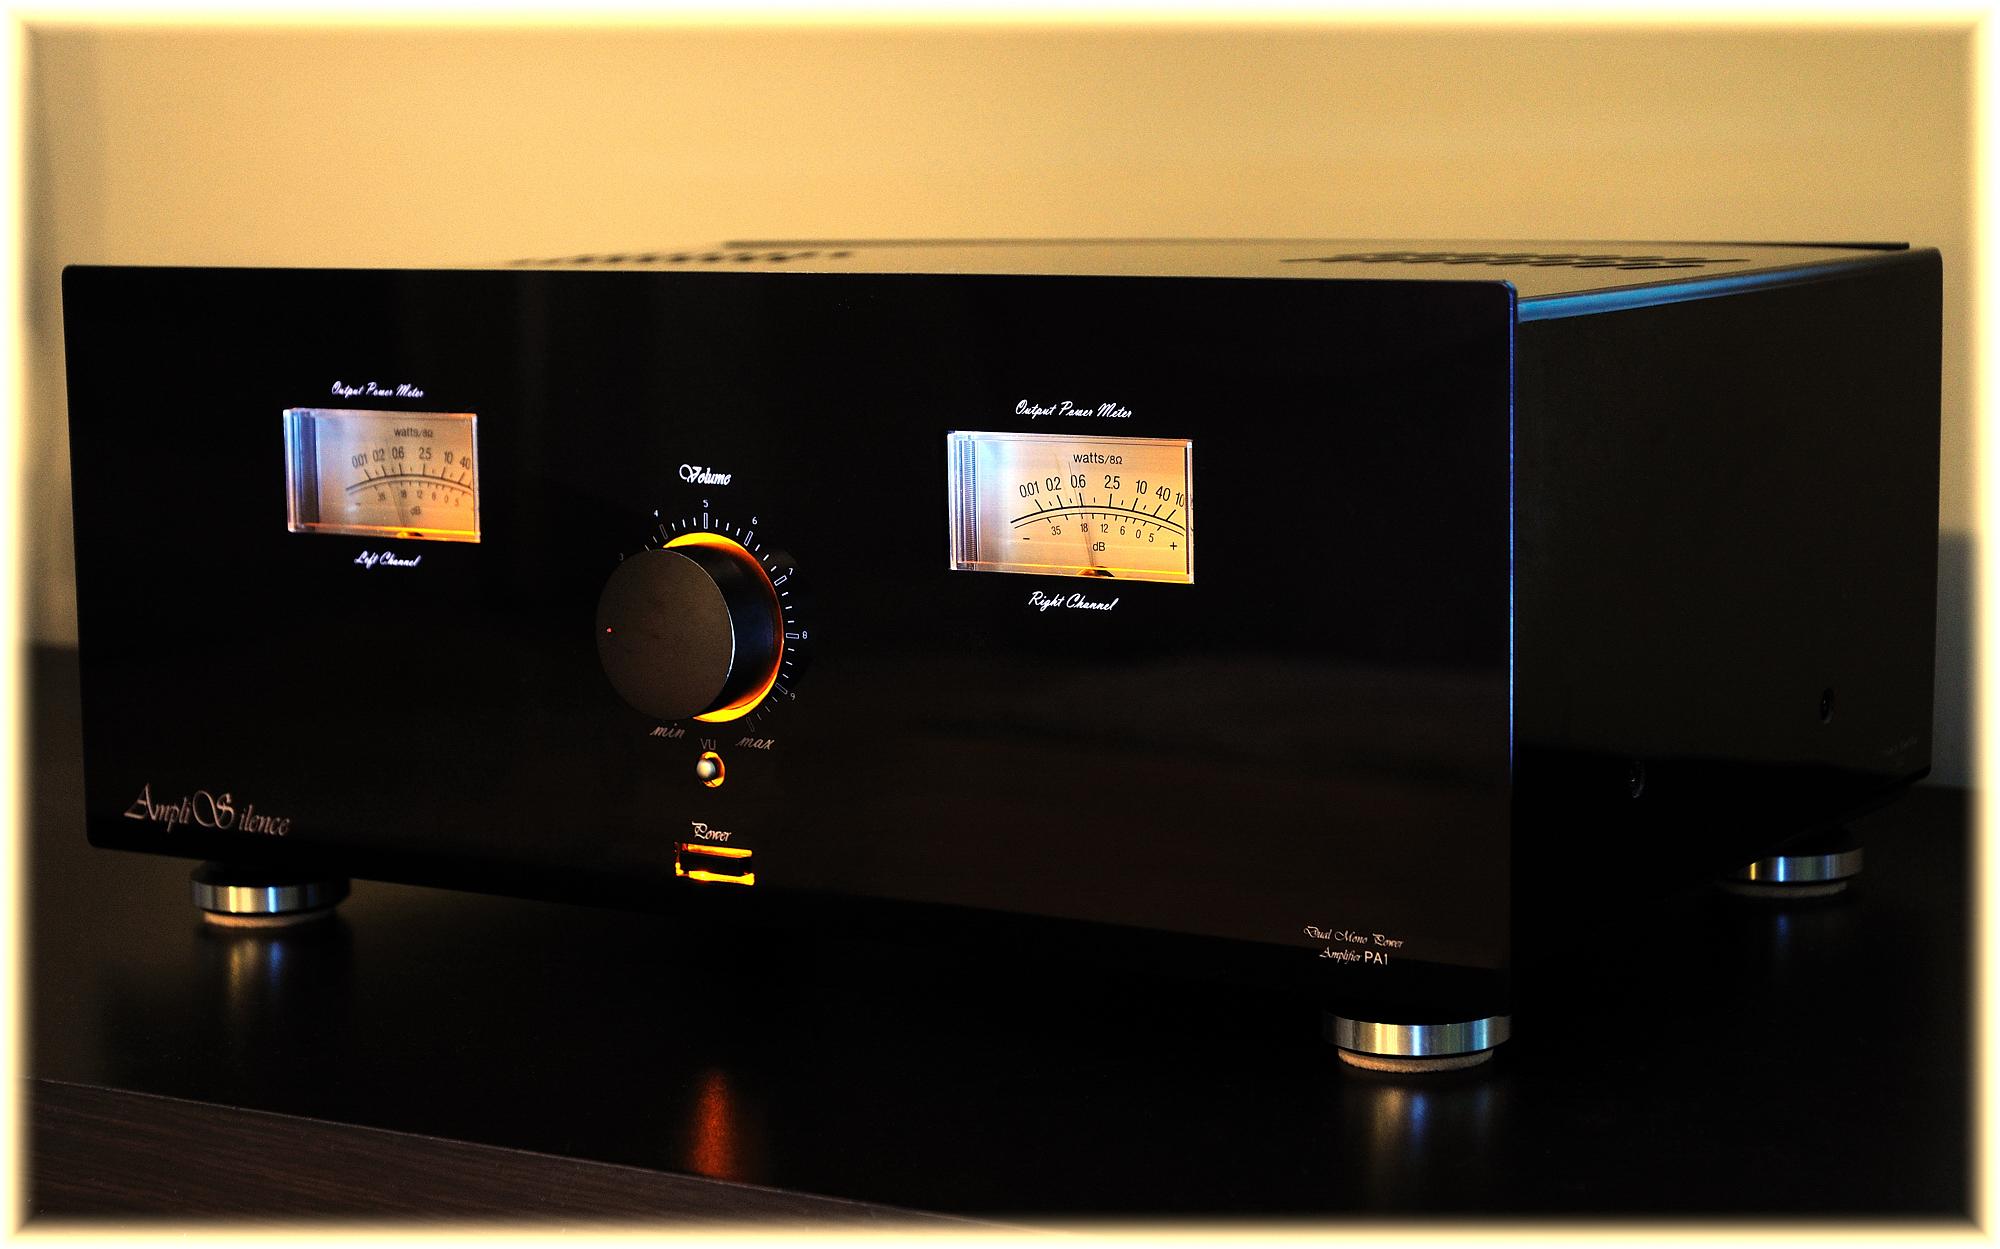 Wzmacniacz AmpliSilence Dual Mono 40W/8ohm RMS